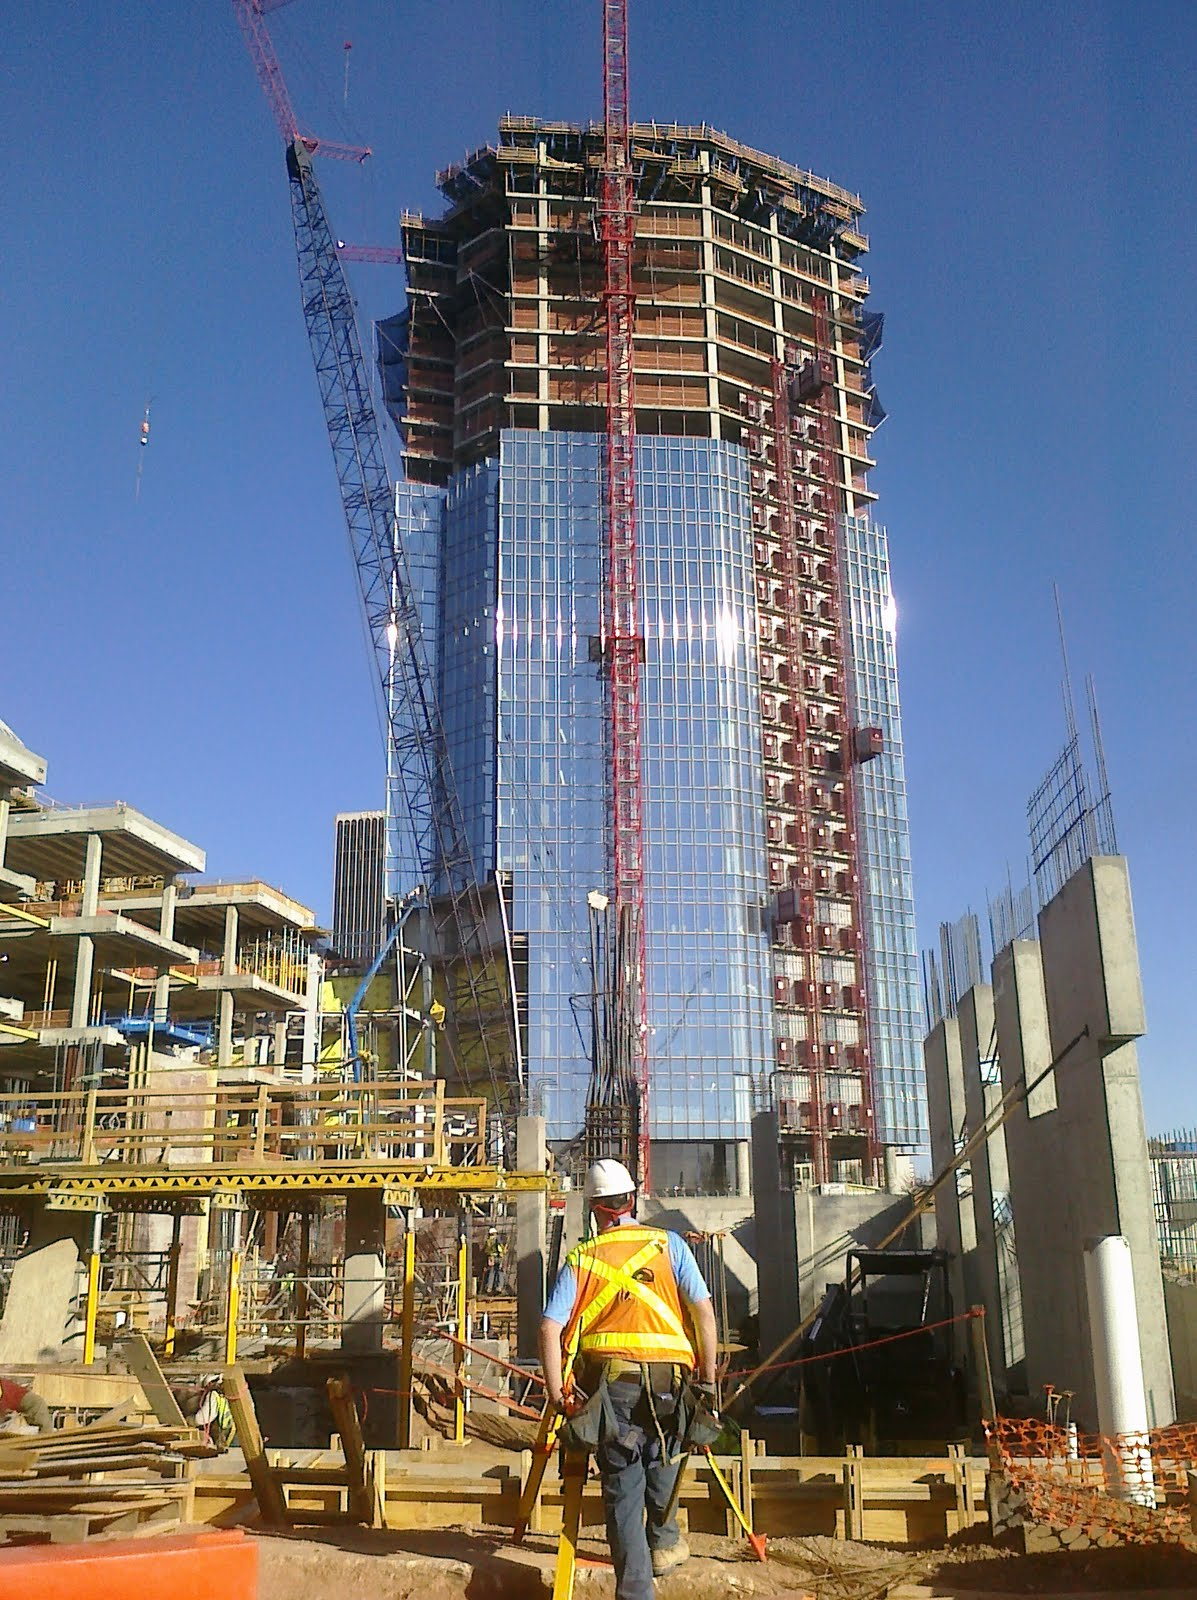 Okc Devon Tower Construction Construction Progress Of